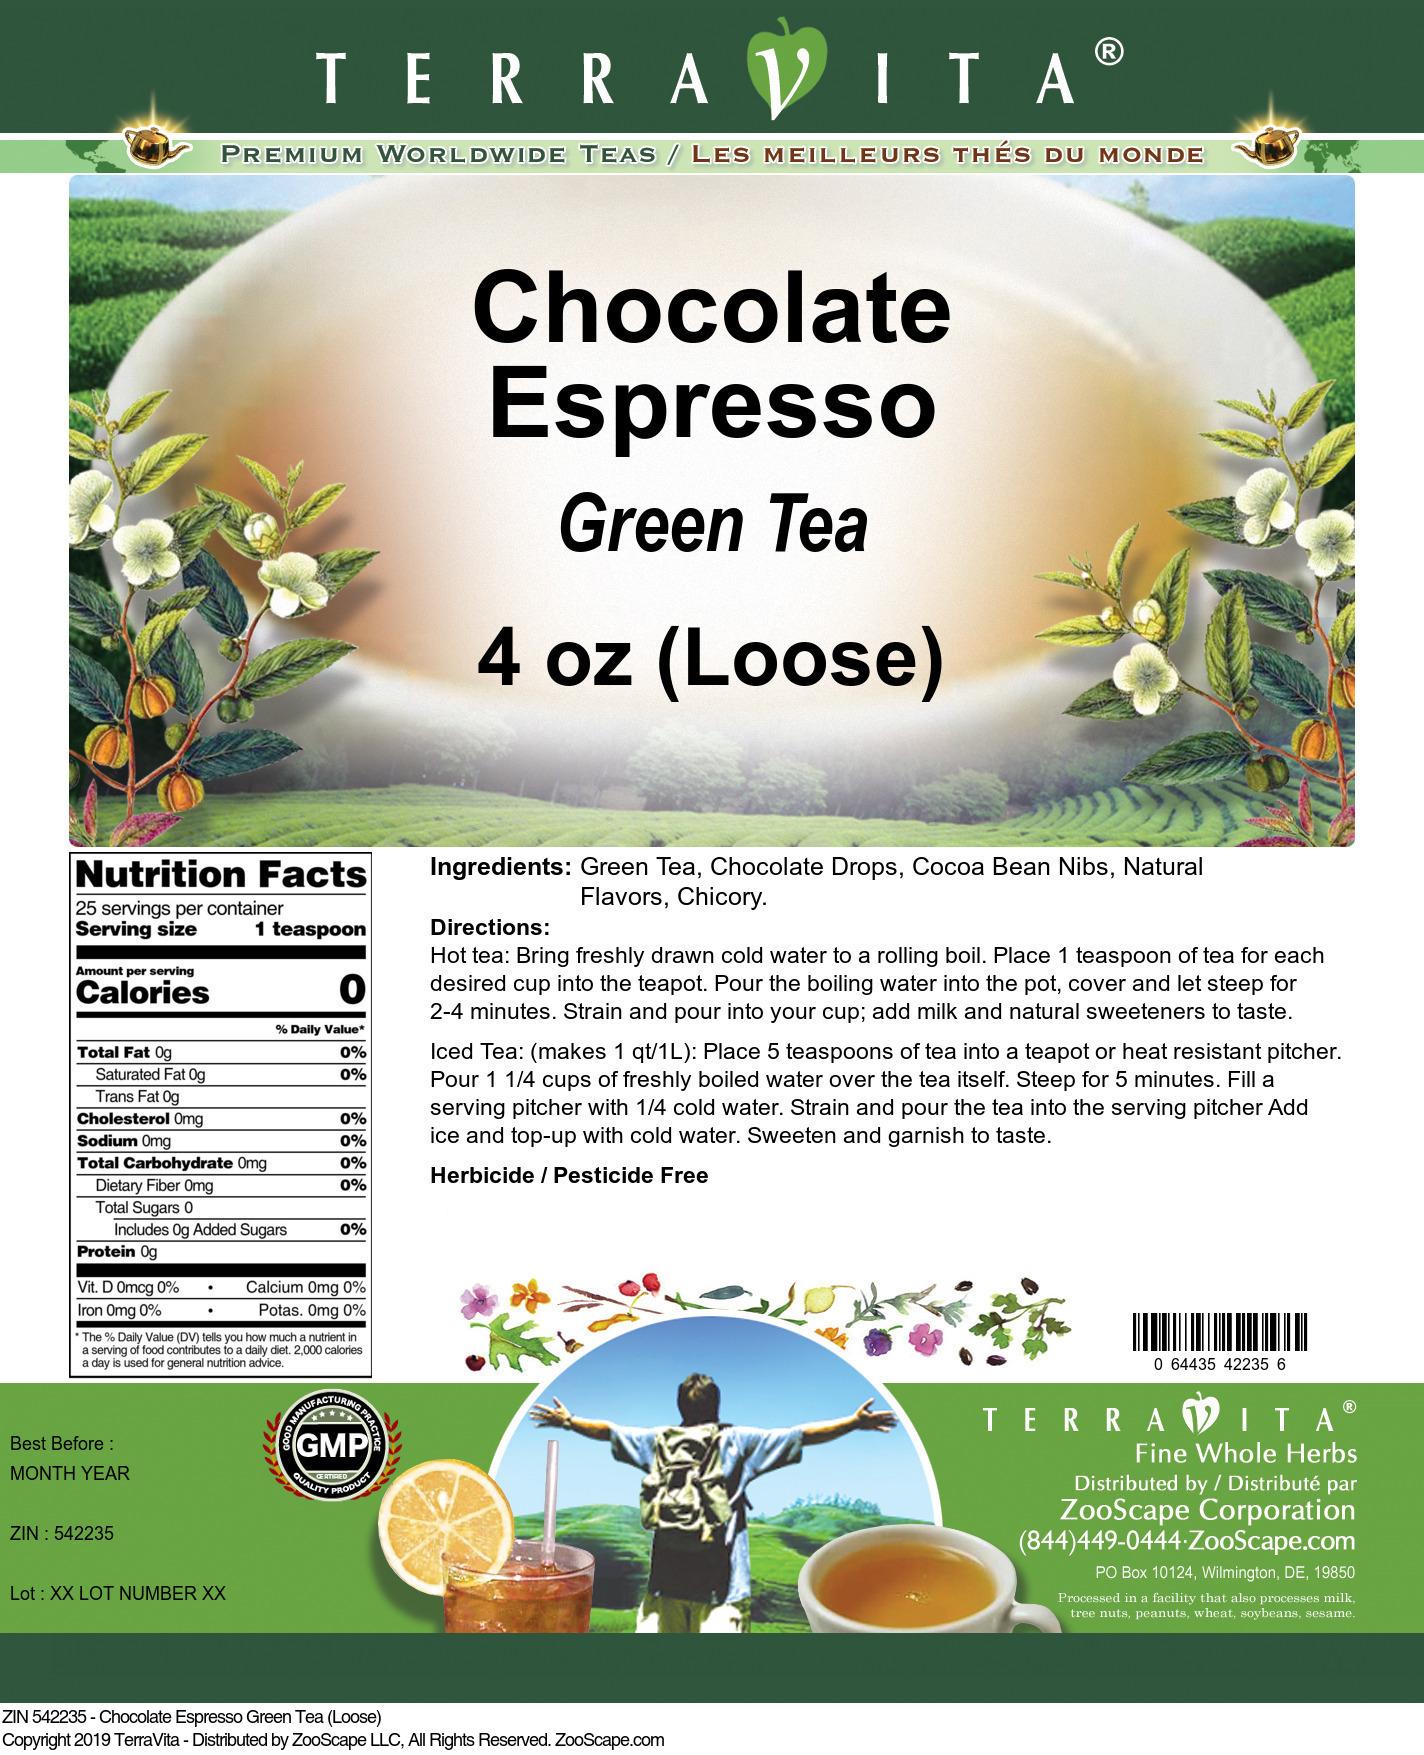 Chocolate Espresso Green Tea (Loose)